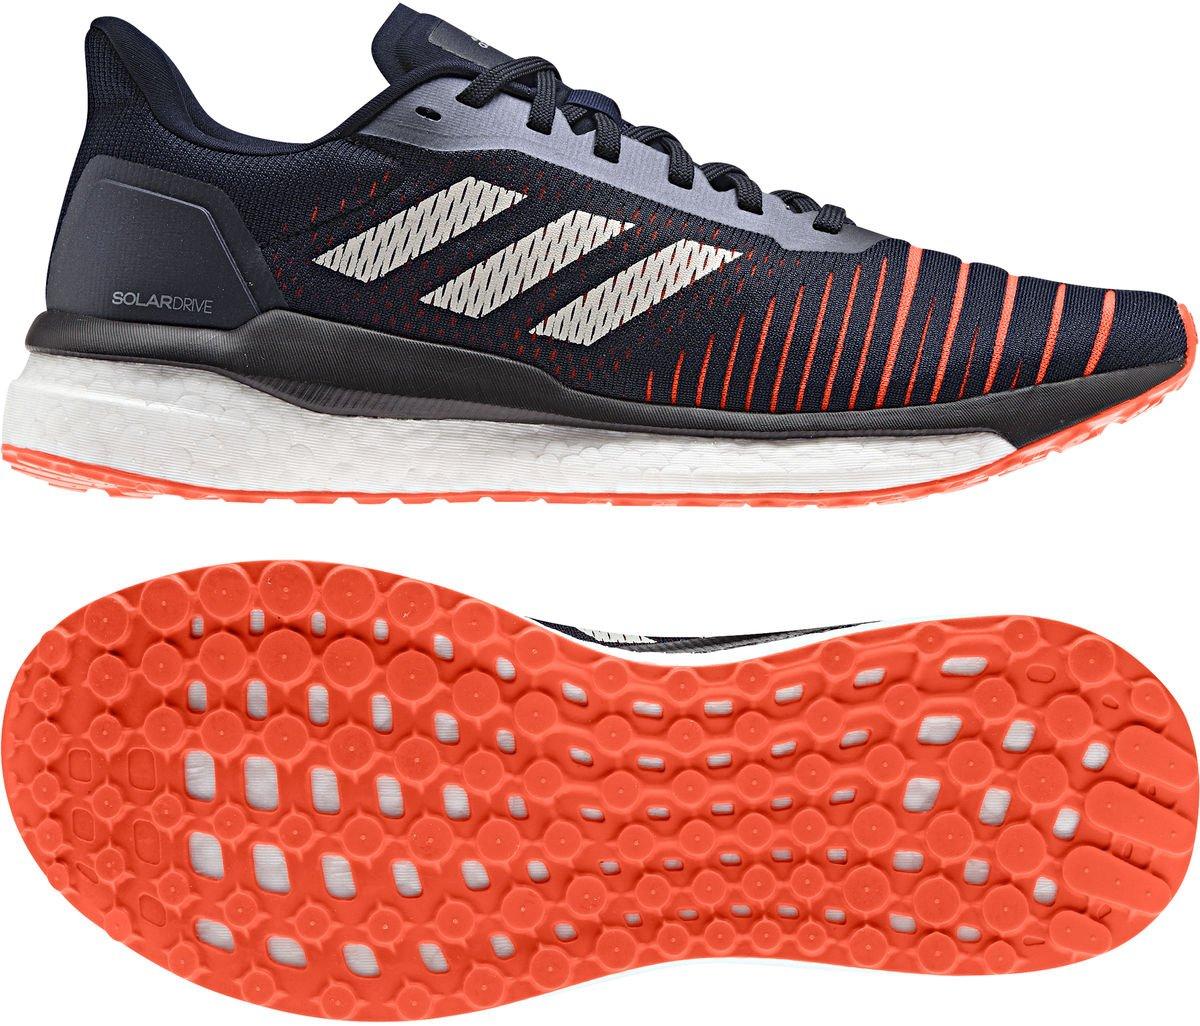 Murciélago Desfiladero Negociar  Running shoes adidas SOLAR DRIVE M - Top4Football.com